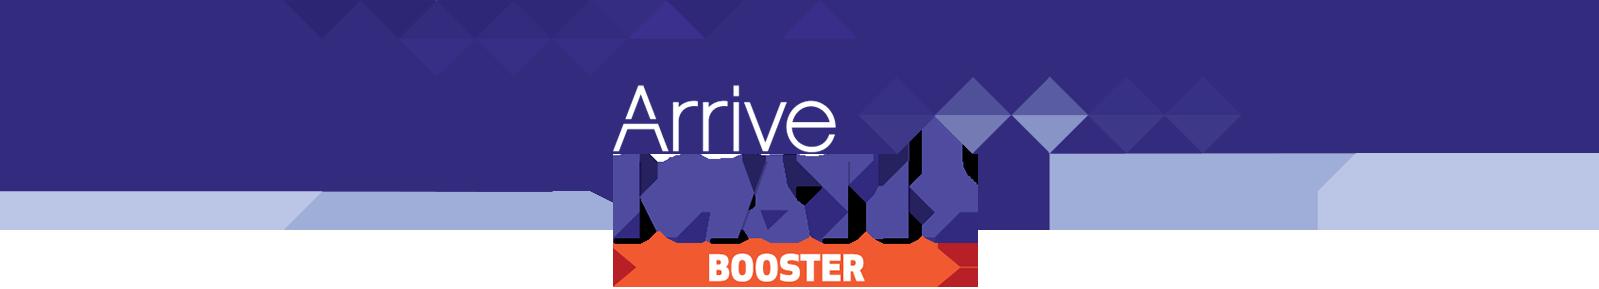 Arrive Math logo